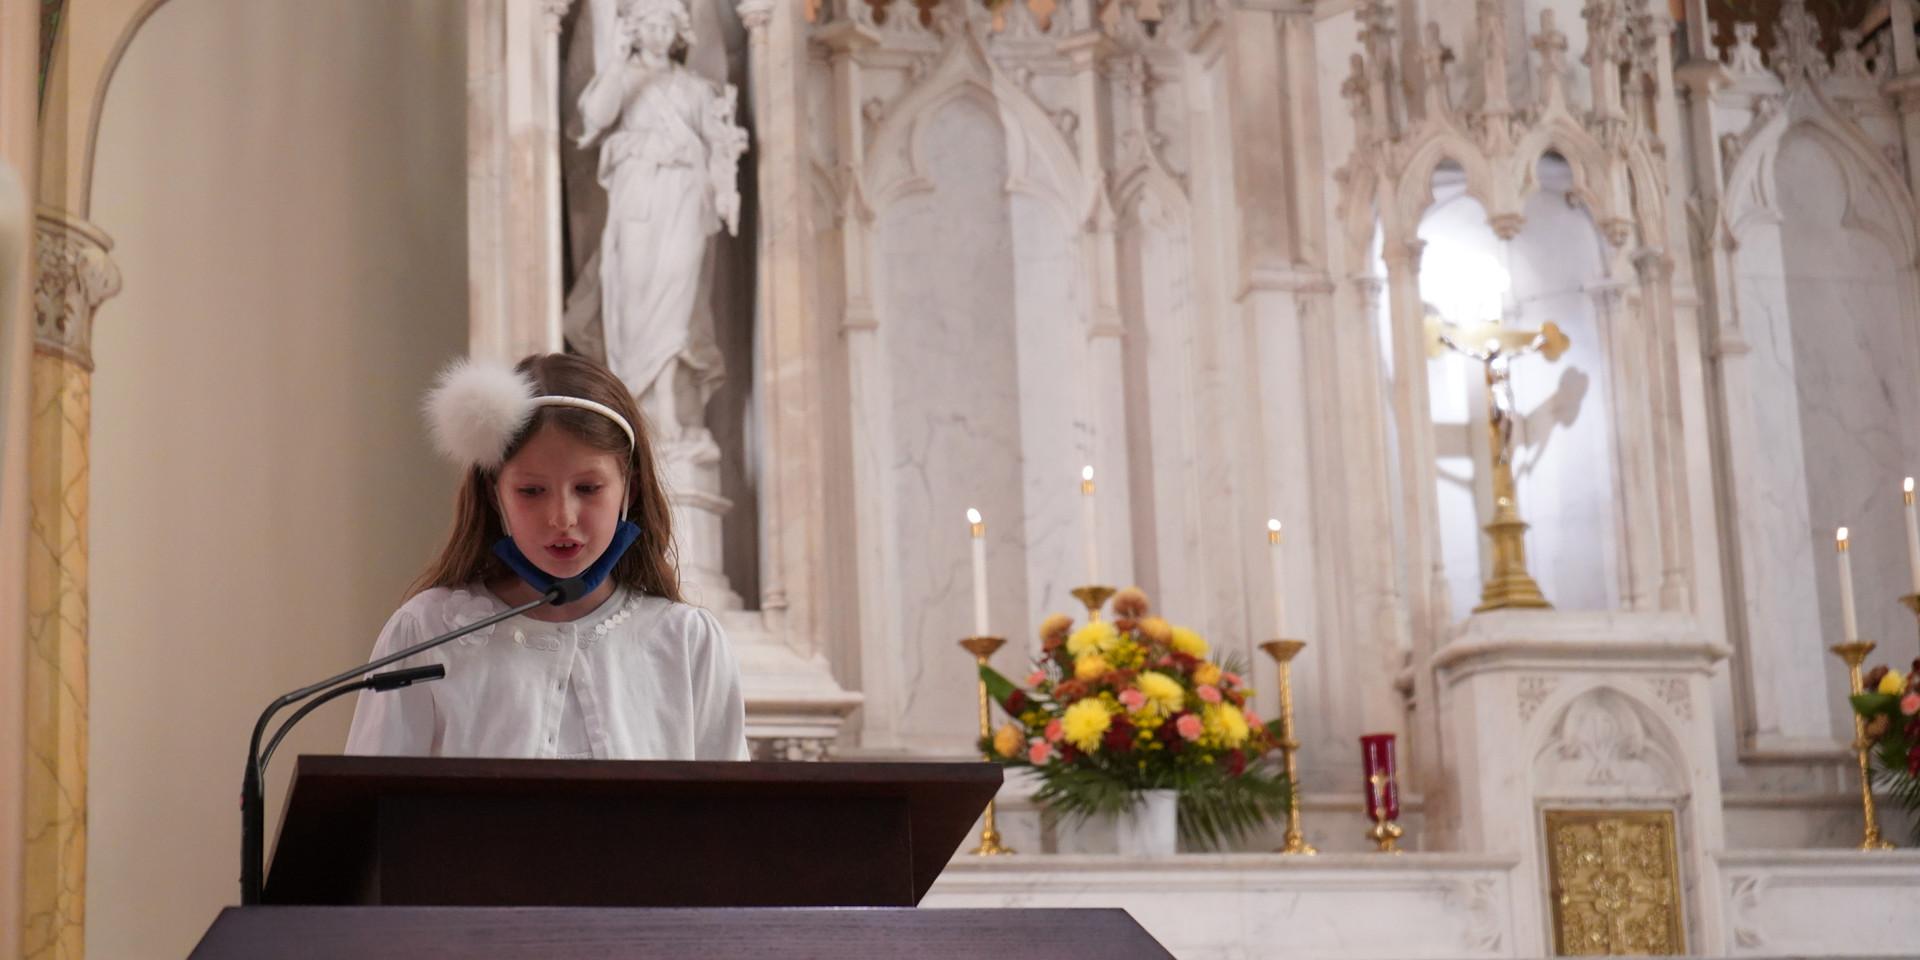 St. Stephen of Hungary School First Communion 2020